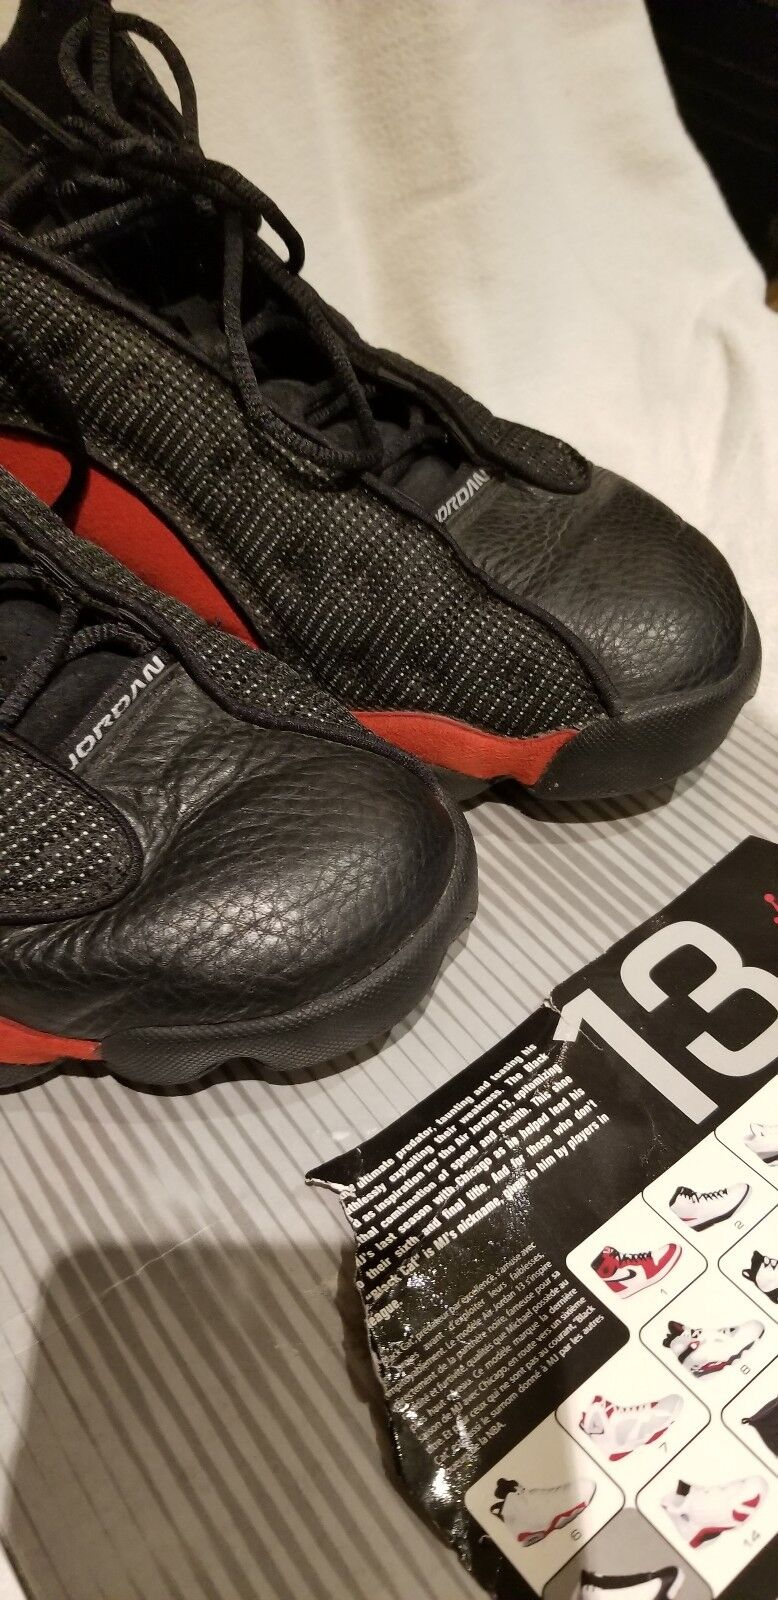 Nike Air Jordan  RETRO 13 SIZE 10 BRED BRED BRED BLACK RED ca61ef